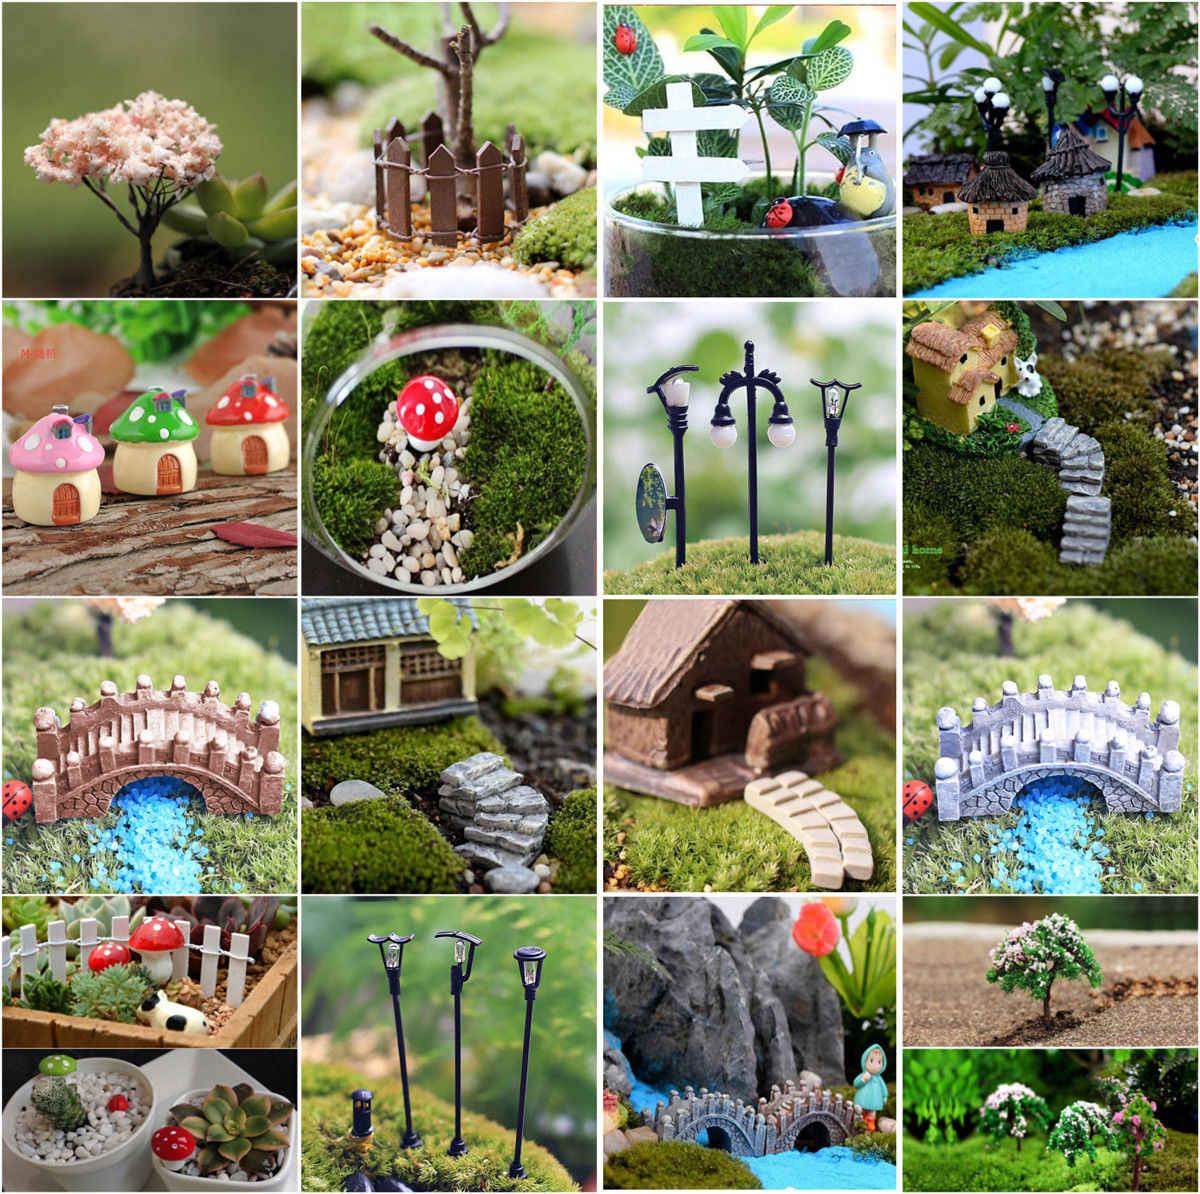 Miniatures Garden Home DIY Crafts Old Couple Micro Landscape Ornaments M